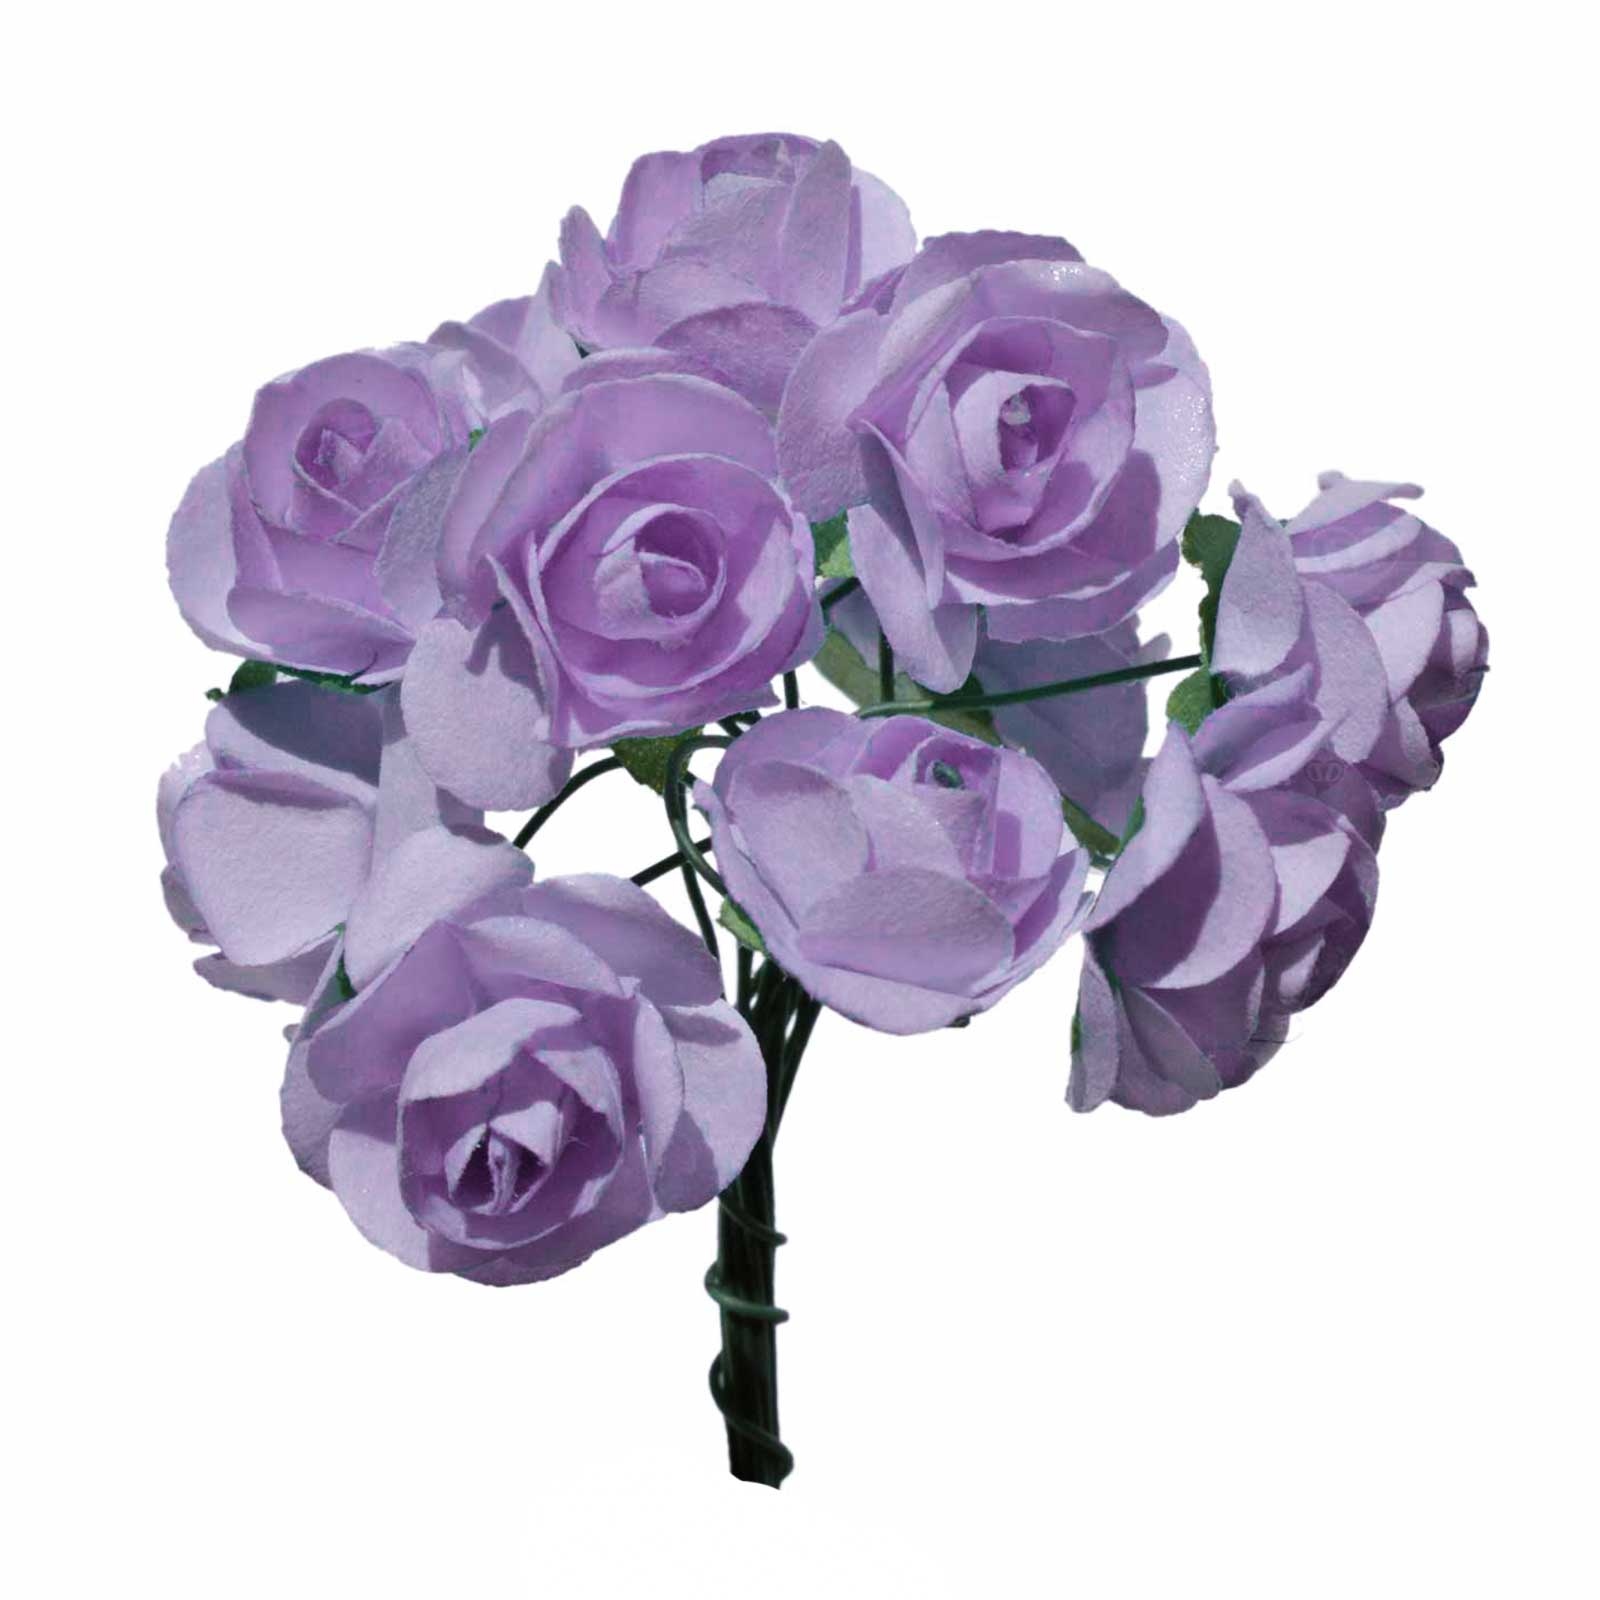 1 Bündel je 12 Rosen Röschen, Länge 7cm, Dekoration, Floristik, Farbe wählbar – Bild 2